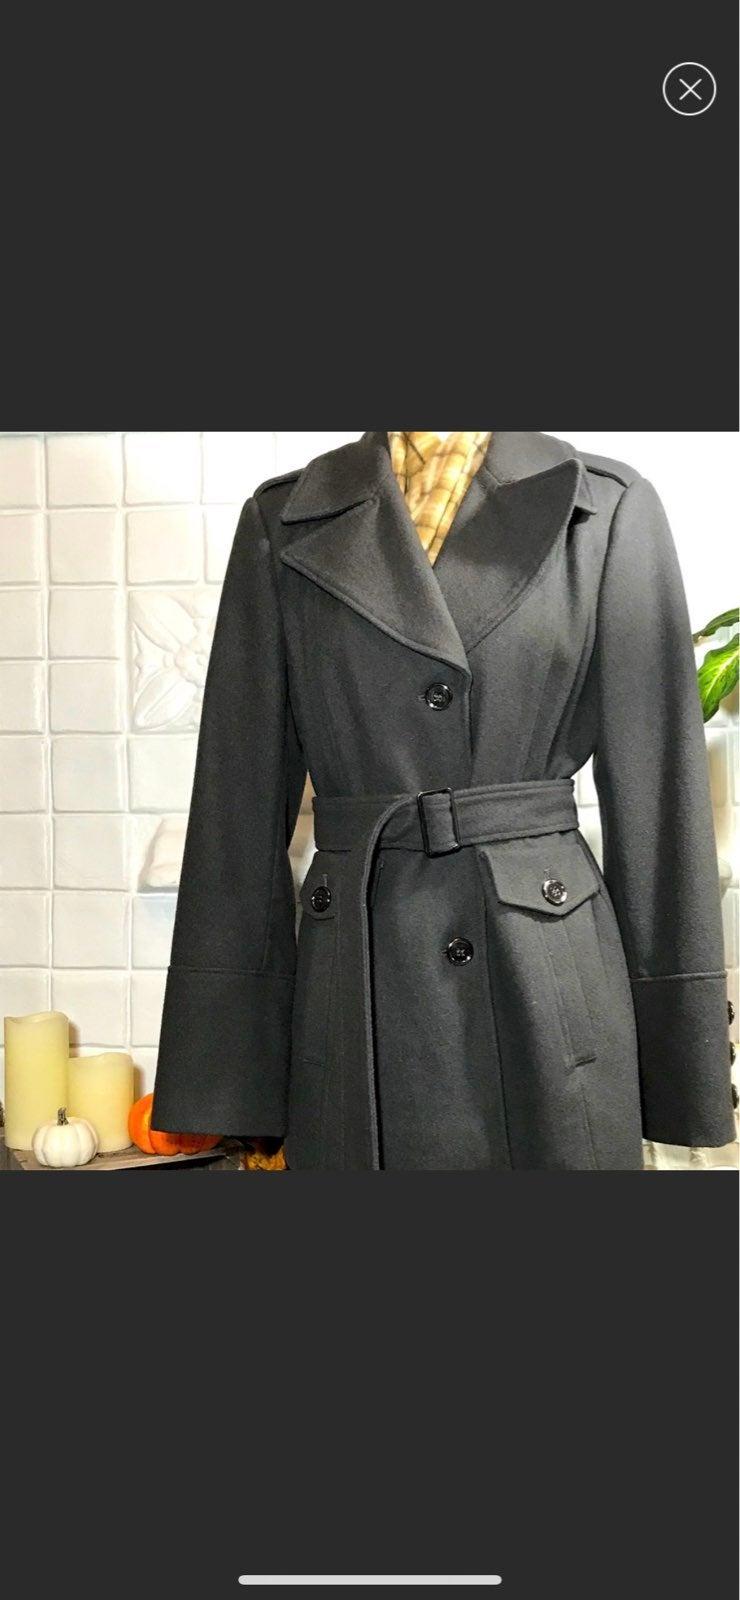 ANTONIO MELANI Charcoal Green Wool Peaco